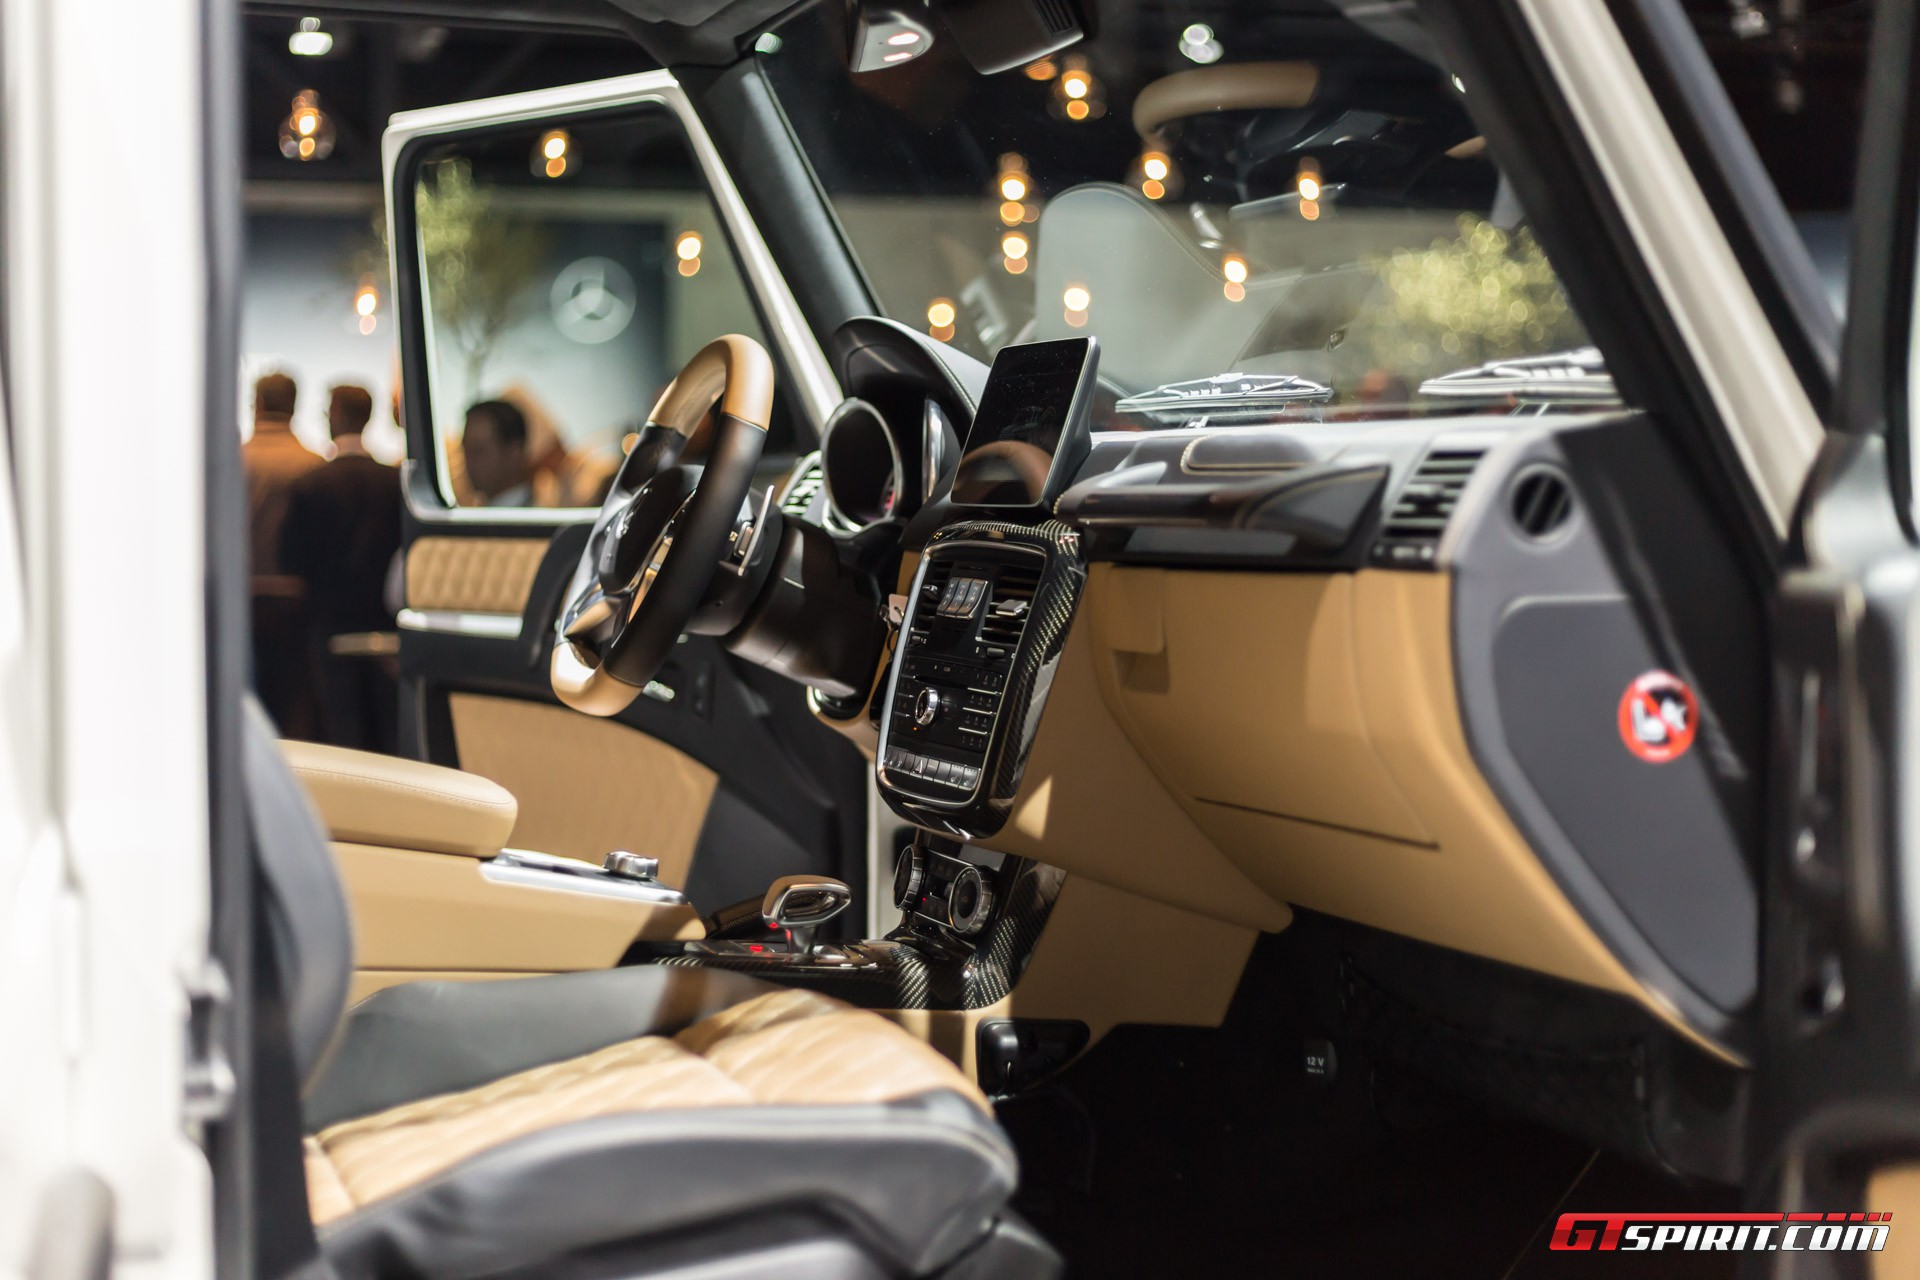 https://storage.googleapis.com/gtspirit/uploads/2017/02/Mercedes-Benz-Maybach-G650-Landaulet-Geneva-2017-8.jpg